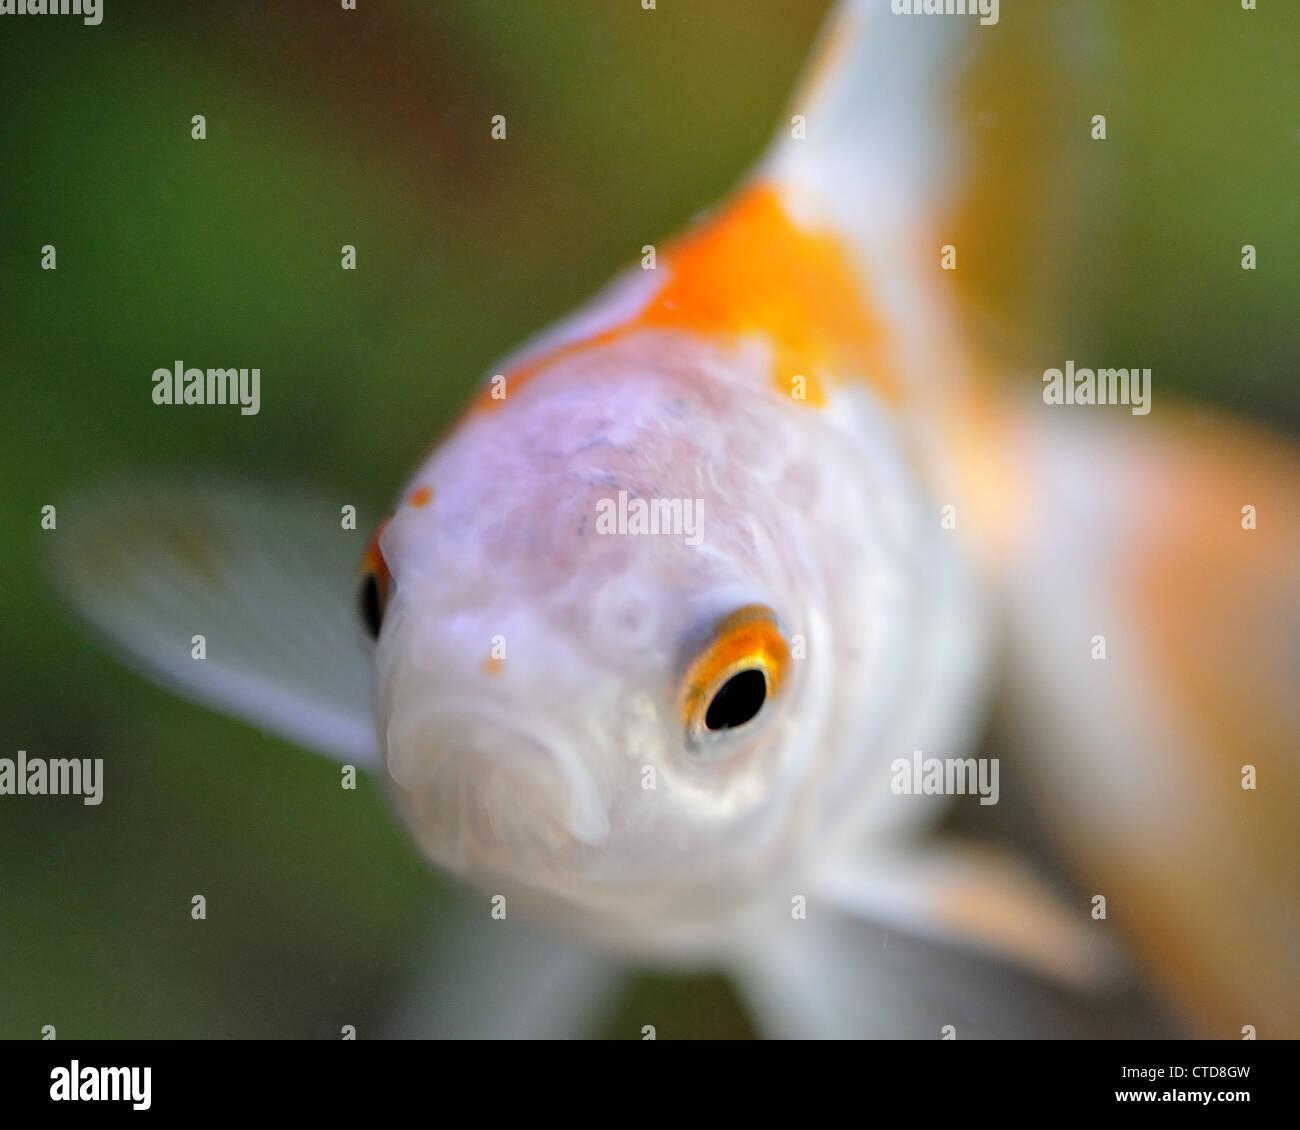 Macro image of a fish - Stock Image